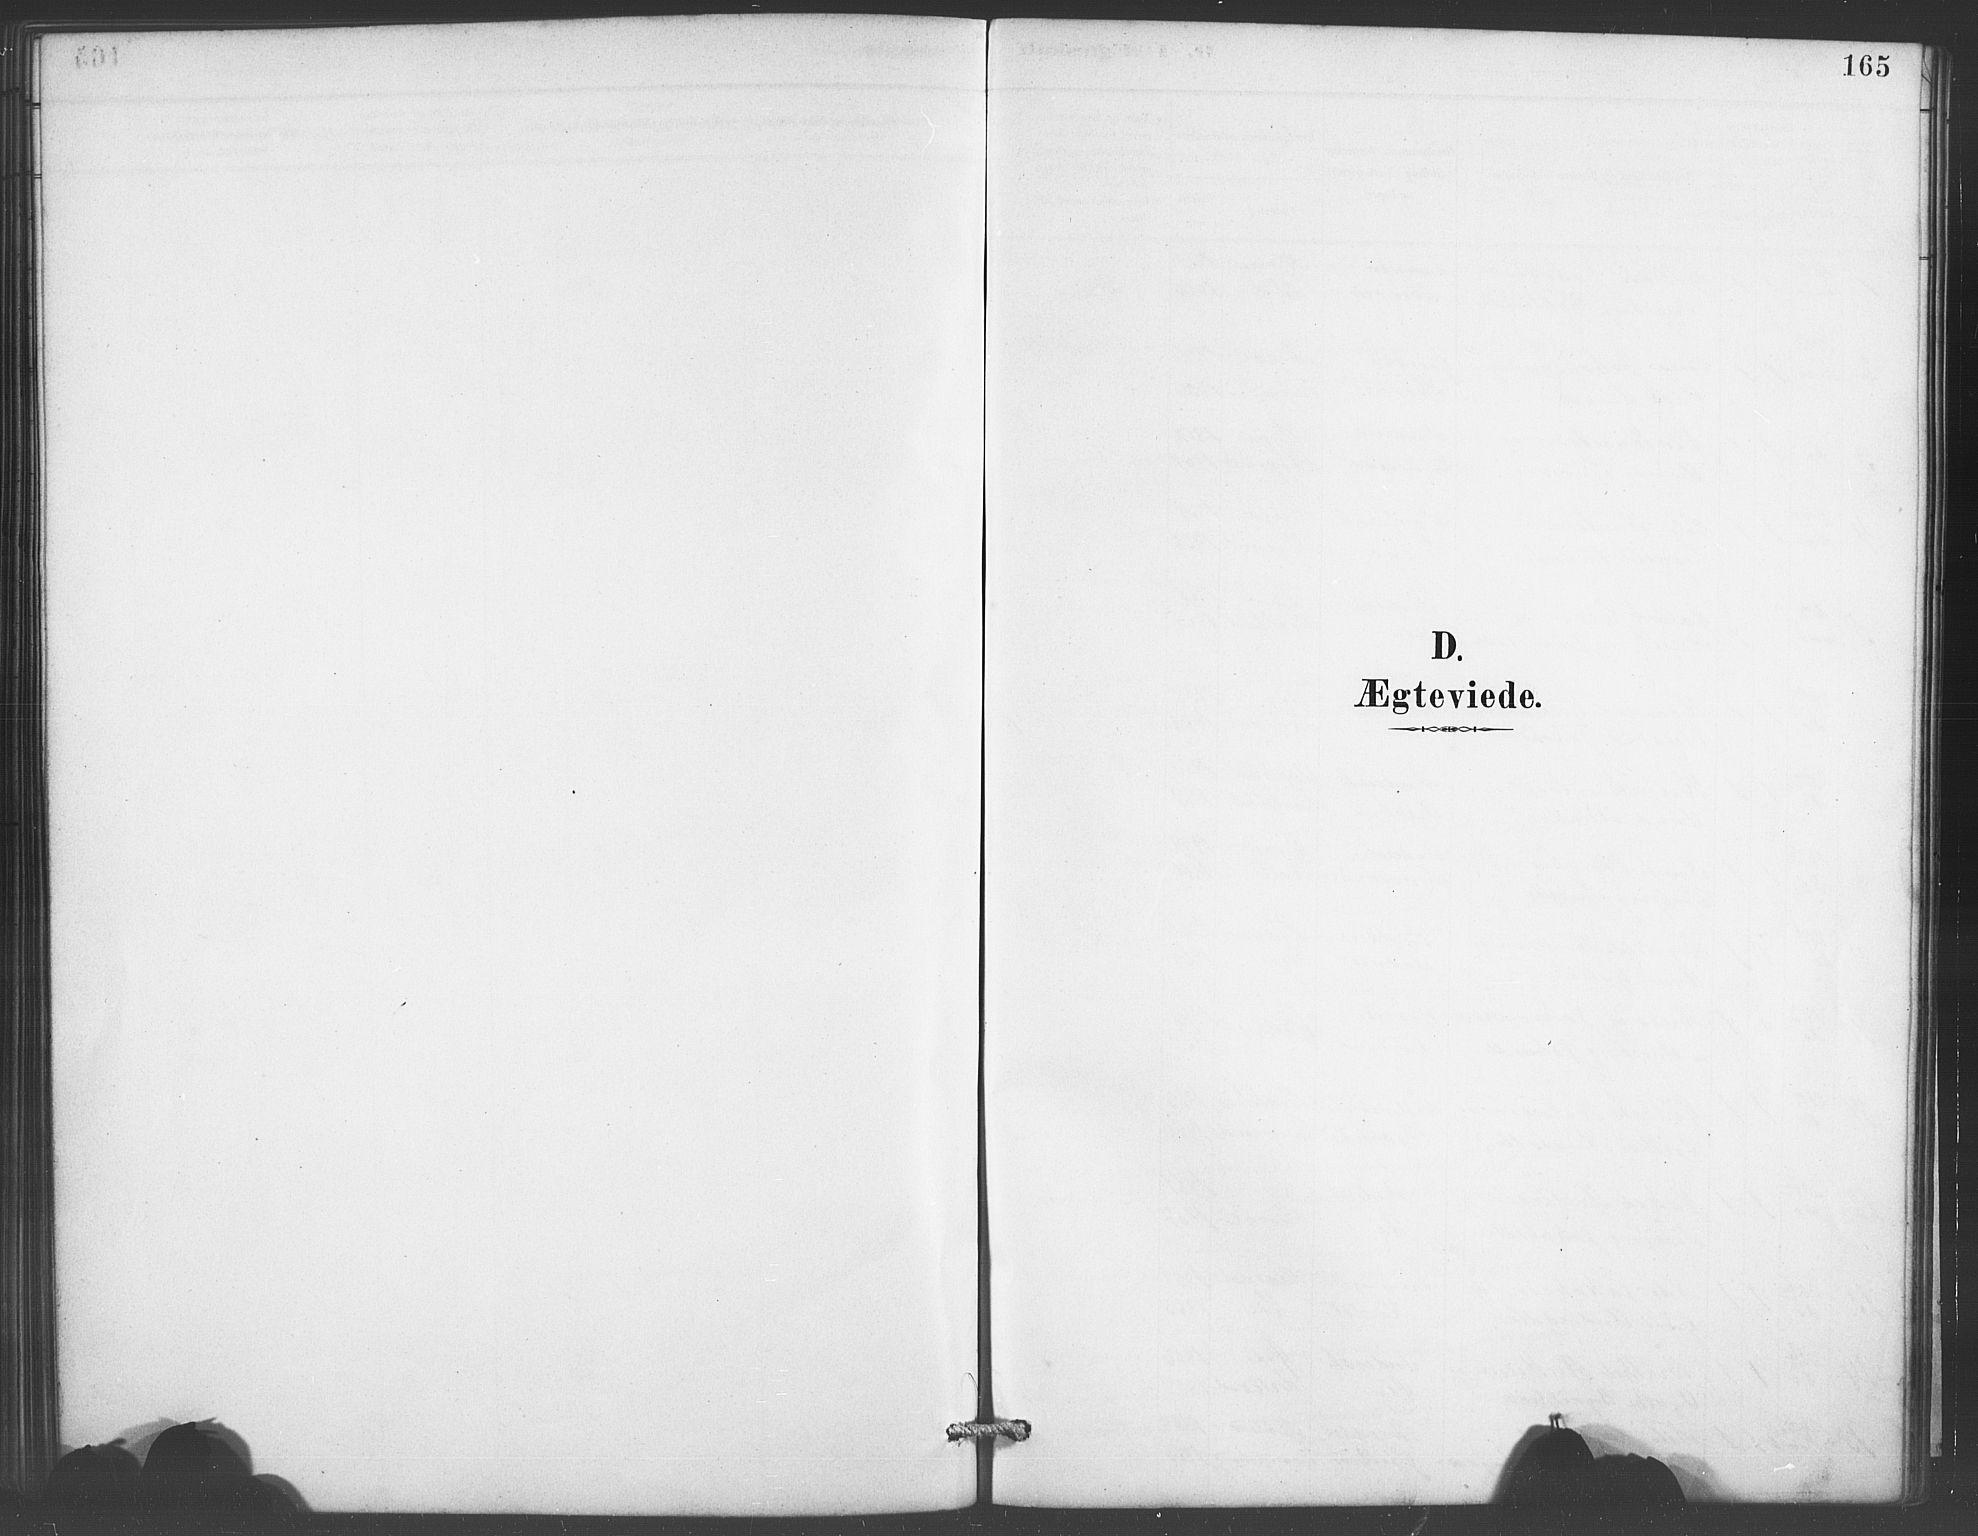 SAB, Evanger sokneprestembete*, Parish register (copy) no. A 4, 1887-1897, p. 165